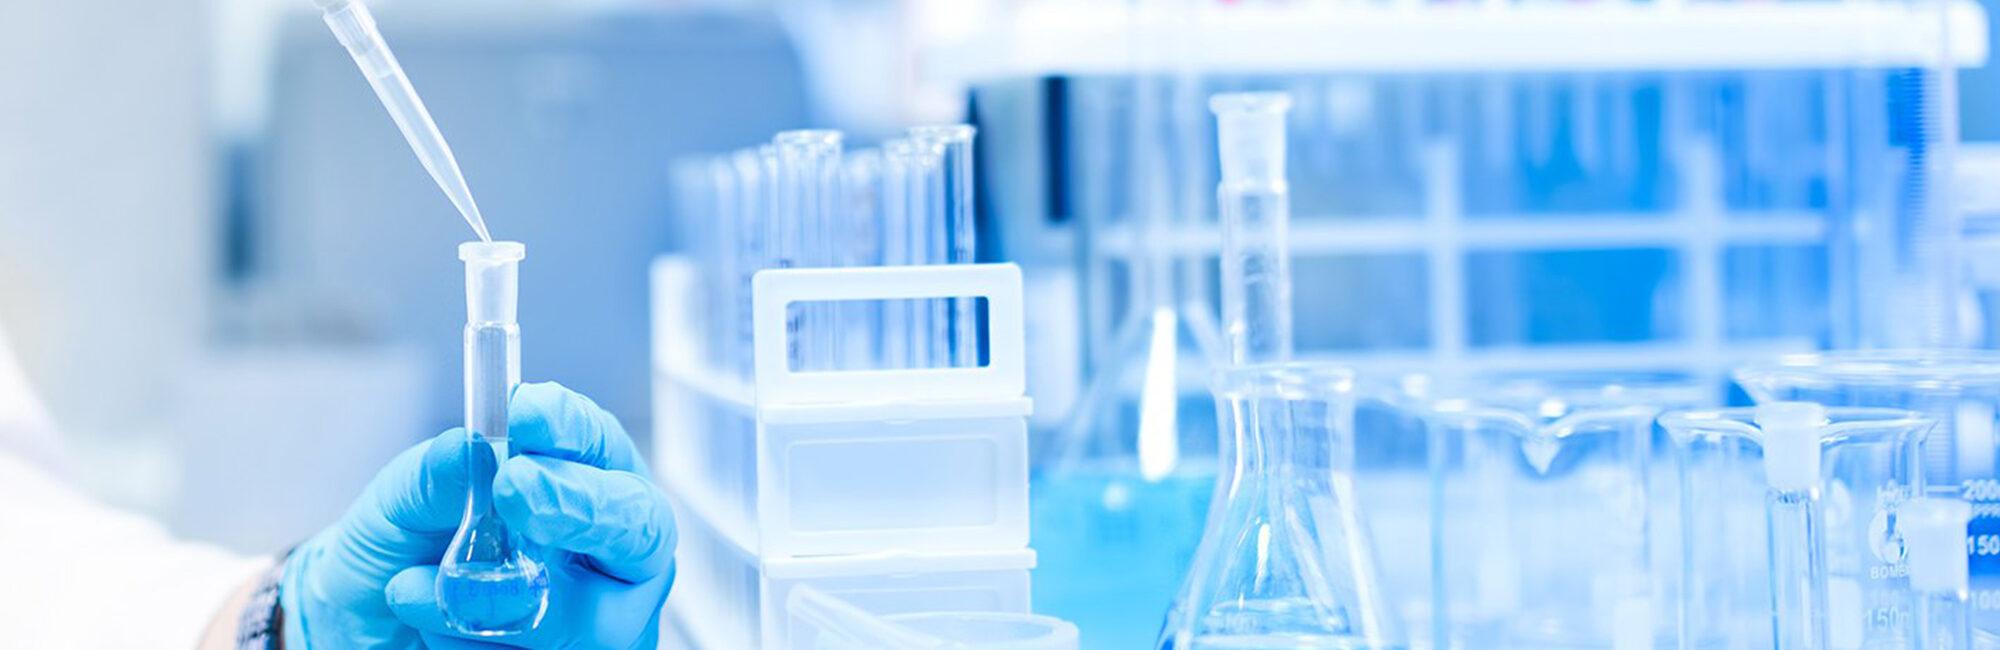 Azolabs laboratory setting